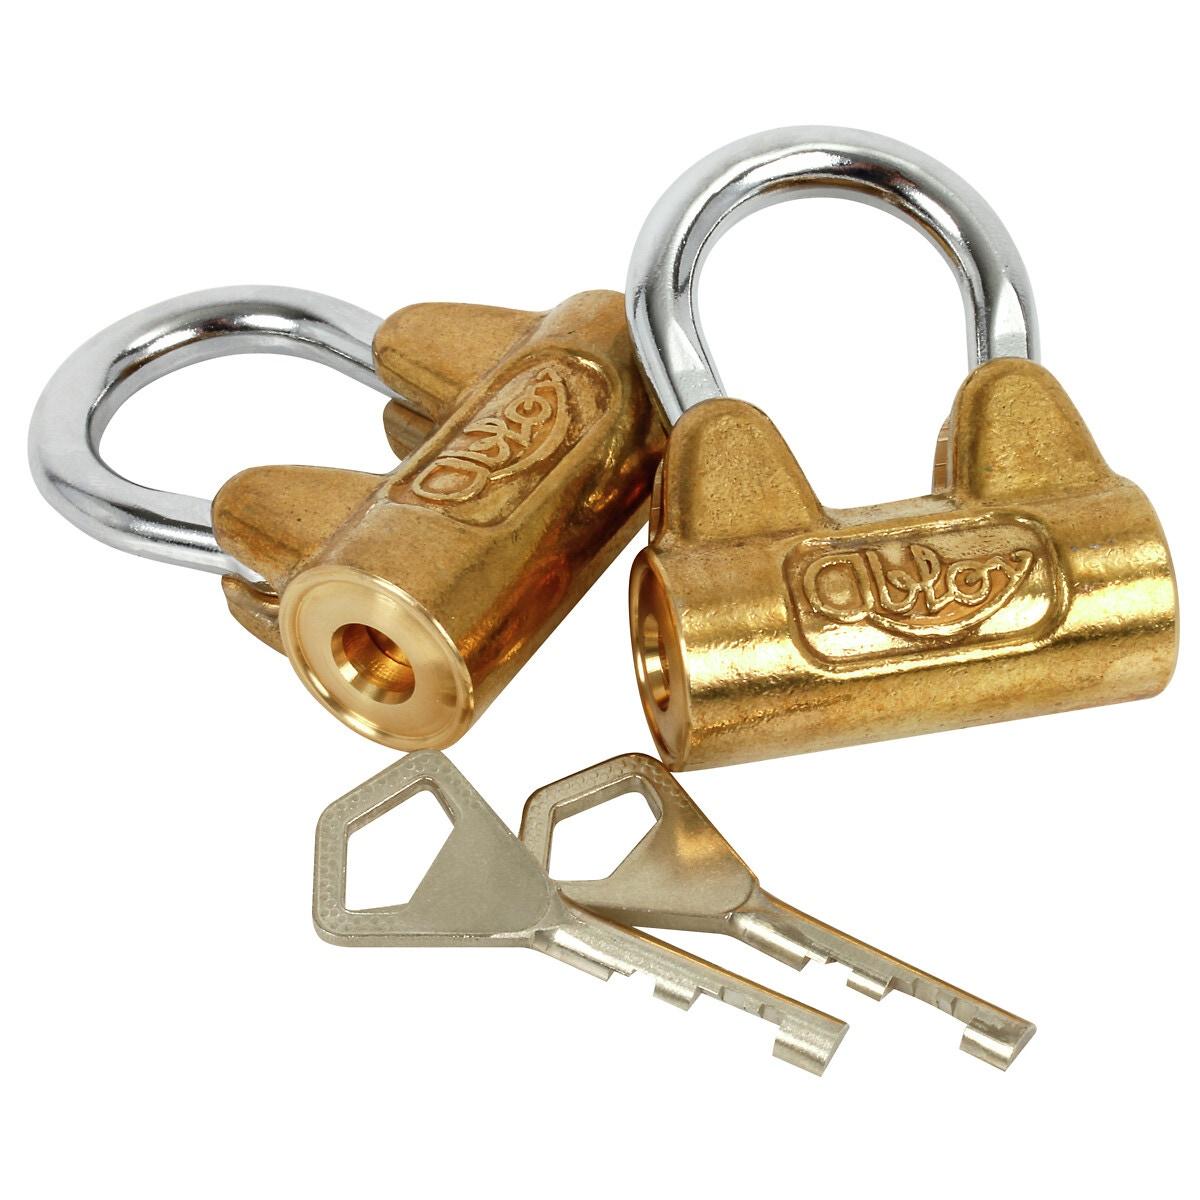 padlock 35mm 2pcs abloy classic 3022 he3022 ikh